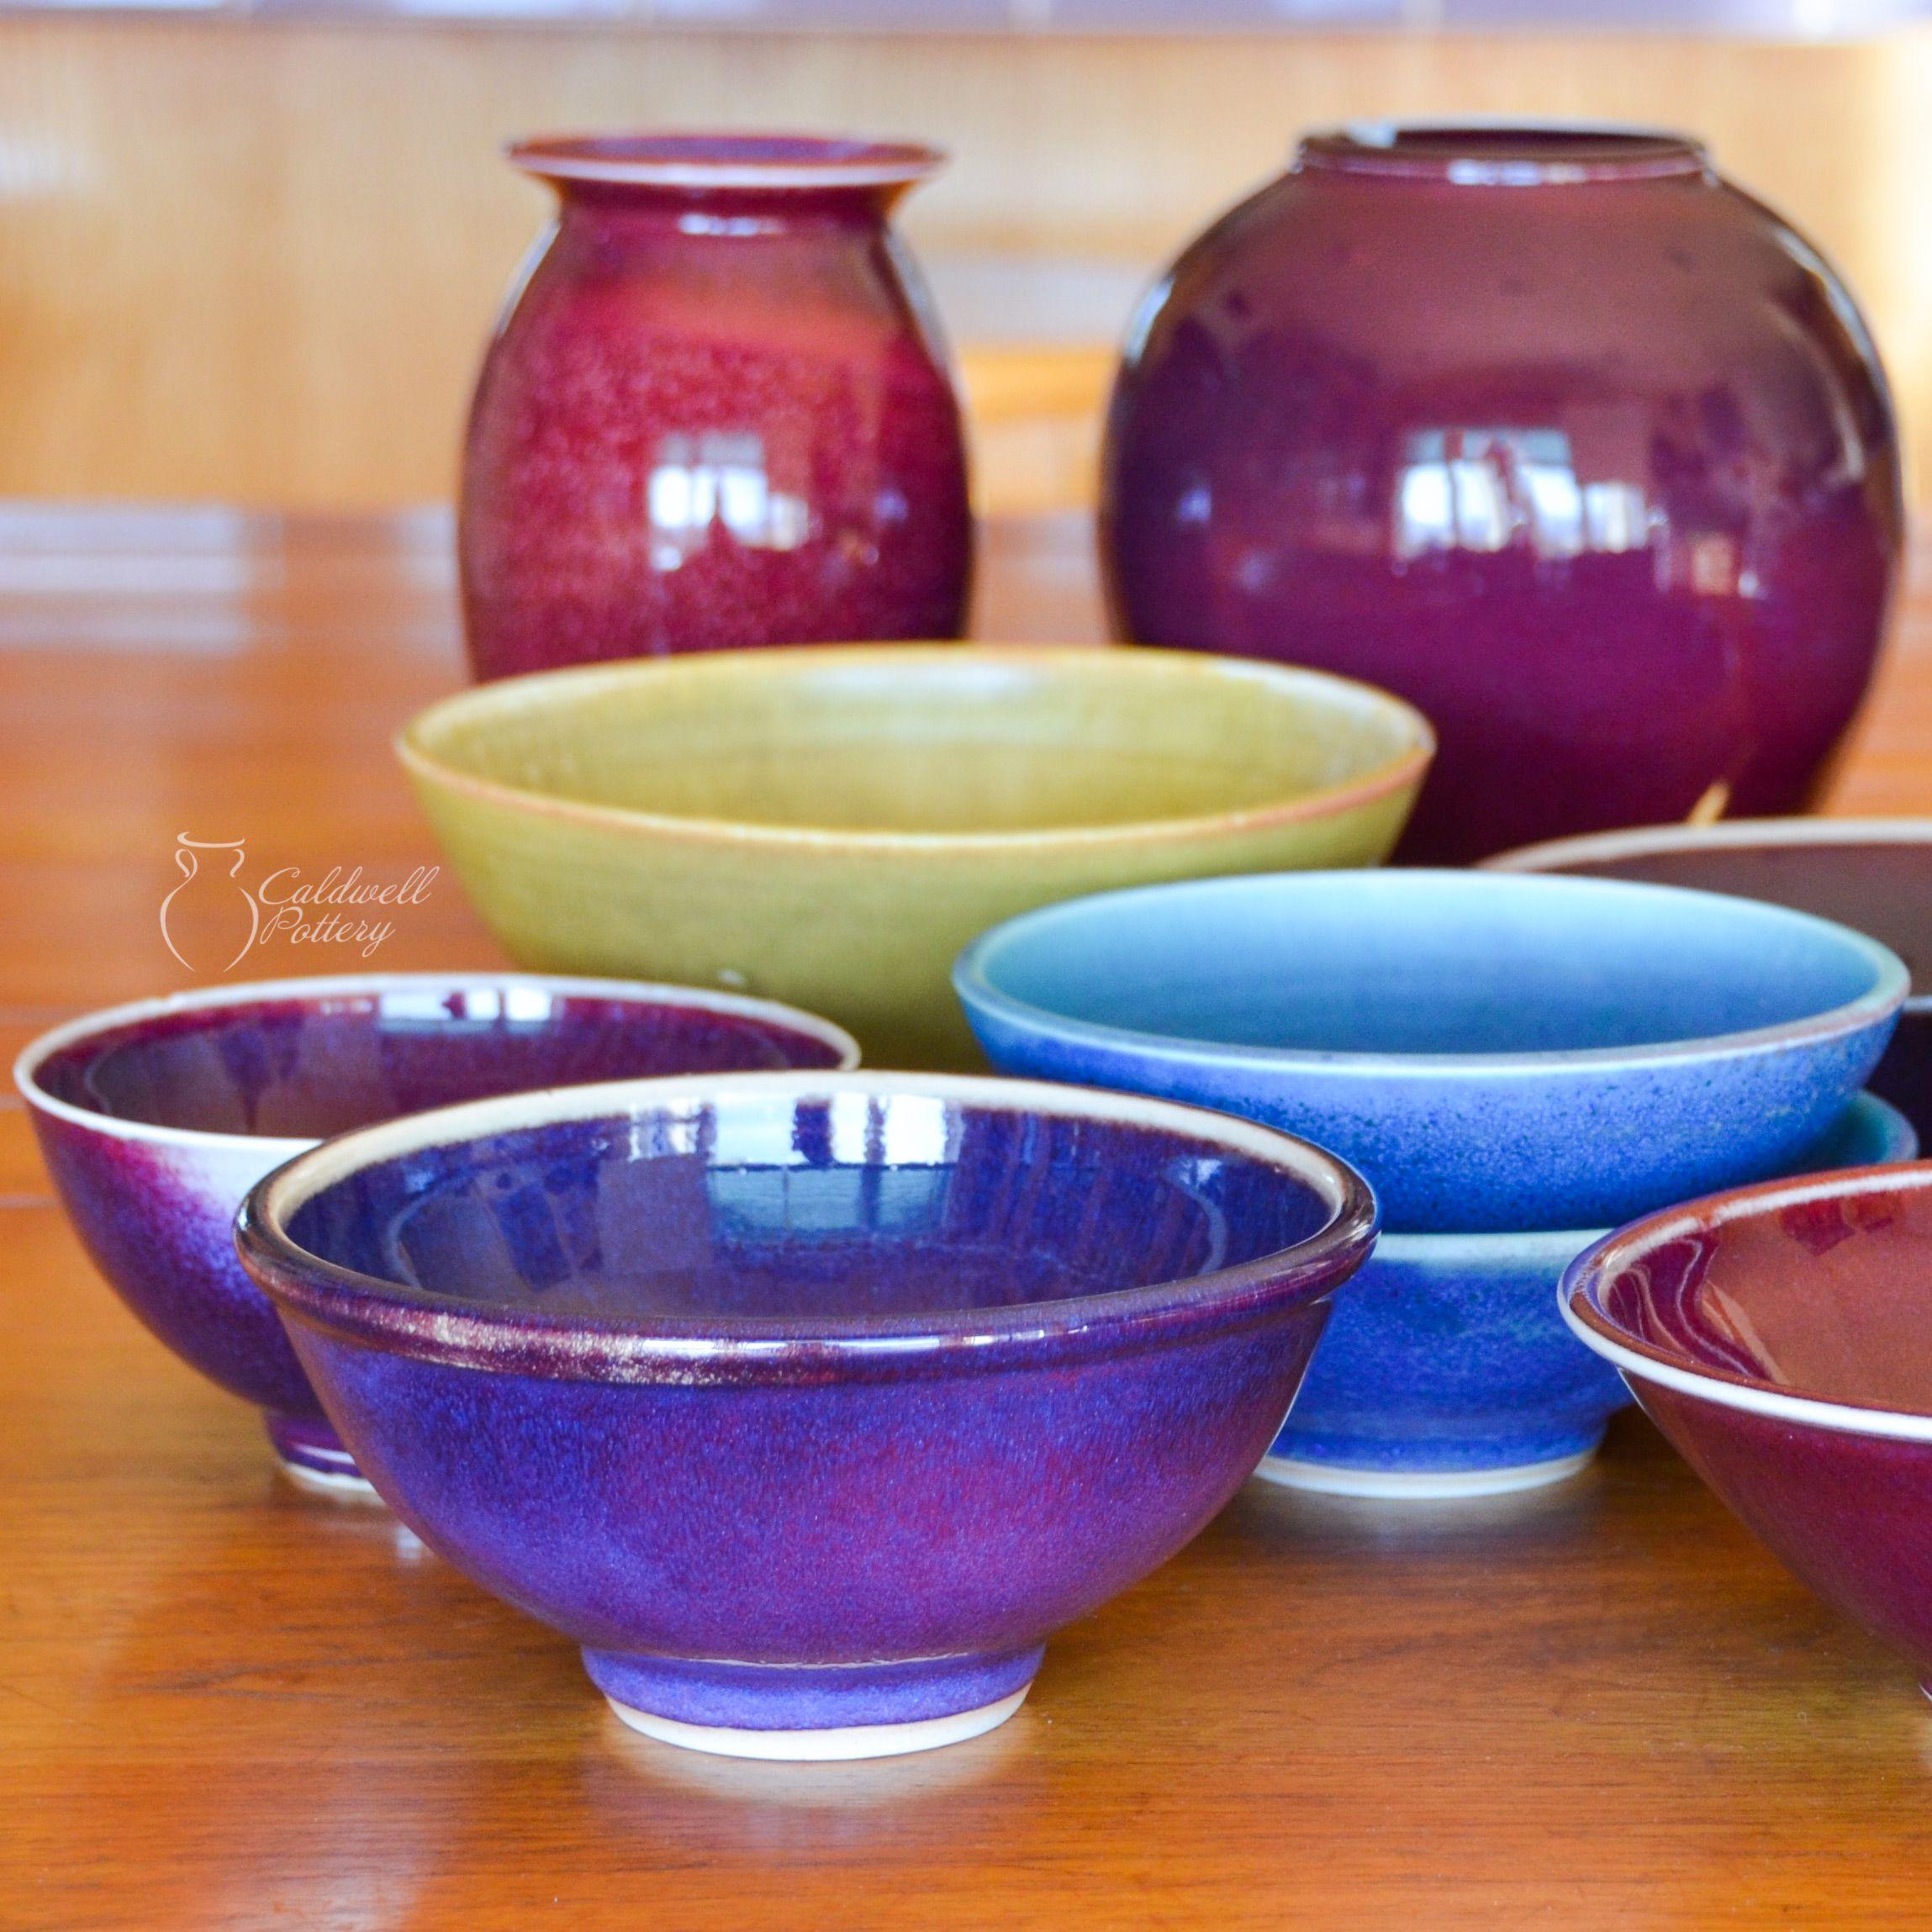 #caldwellpottery #pottery #potter #wheelthrownpottery #ceramics #etsy #etsyfinds #interiordesign #interiordecorating #homeideas #homerenovation #art #artist #parkcityutah #clay #porcelain #cone10 #potterylife #potteryaddict #instapottery #instaartist #homesweethome #homegoods #homeideas